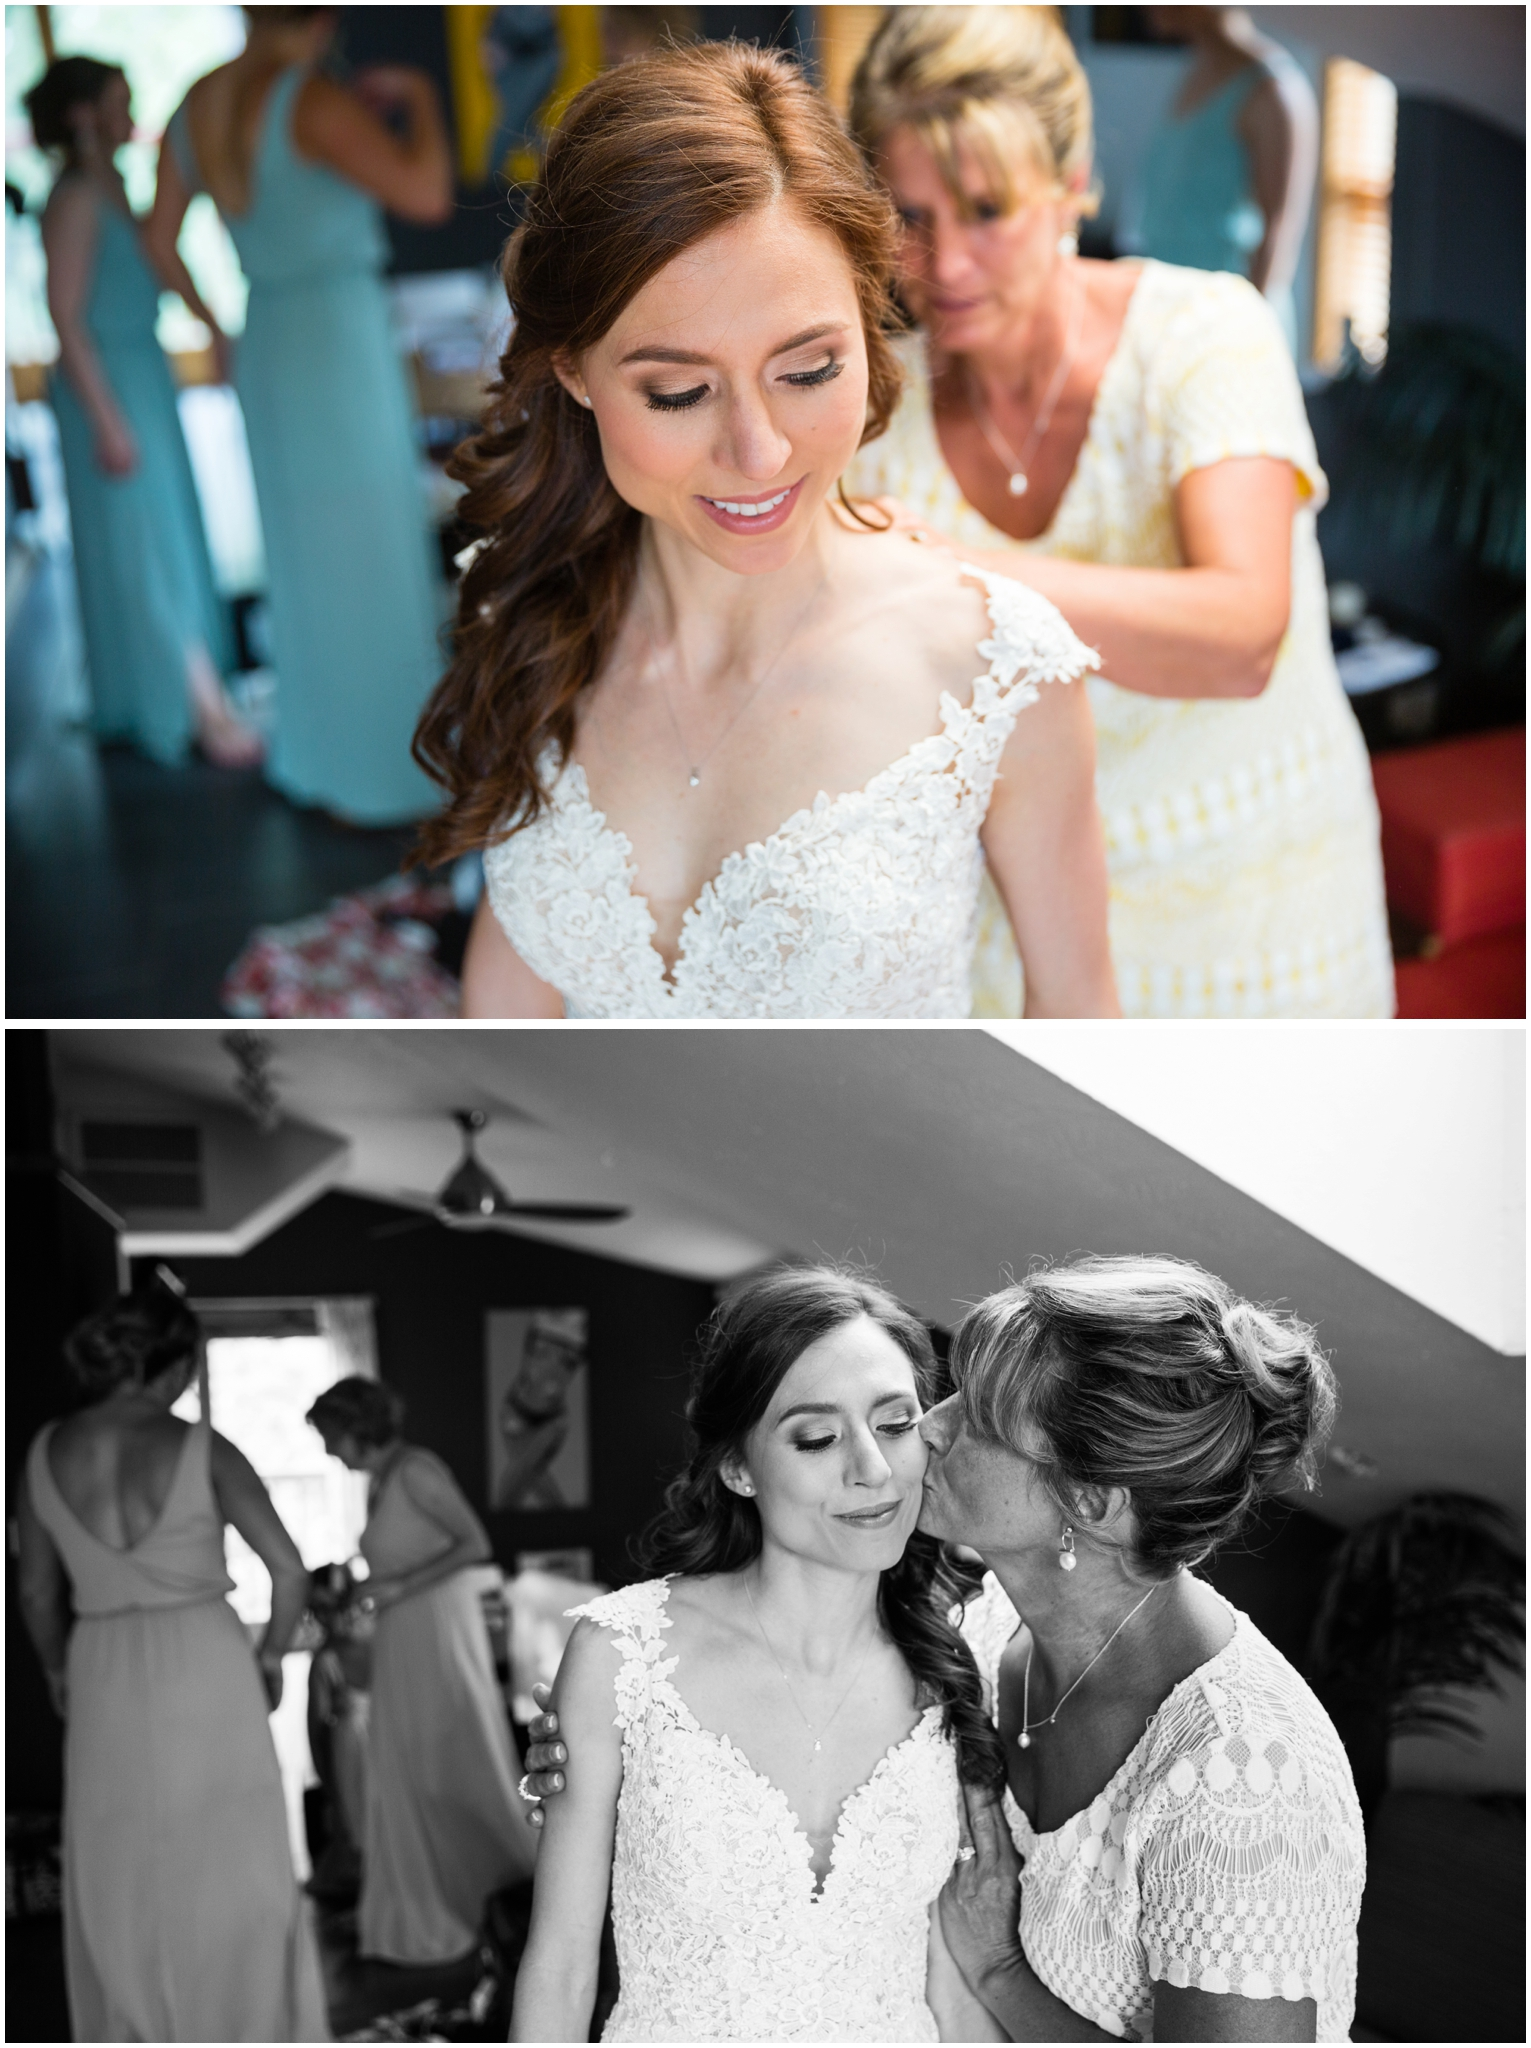 Denver_Wedding_Photographer_Bride_With_Mom.JPG